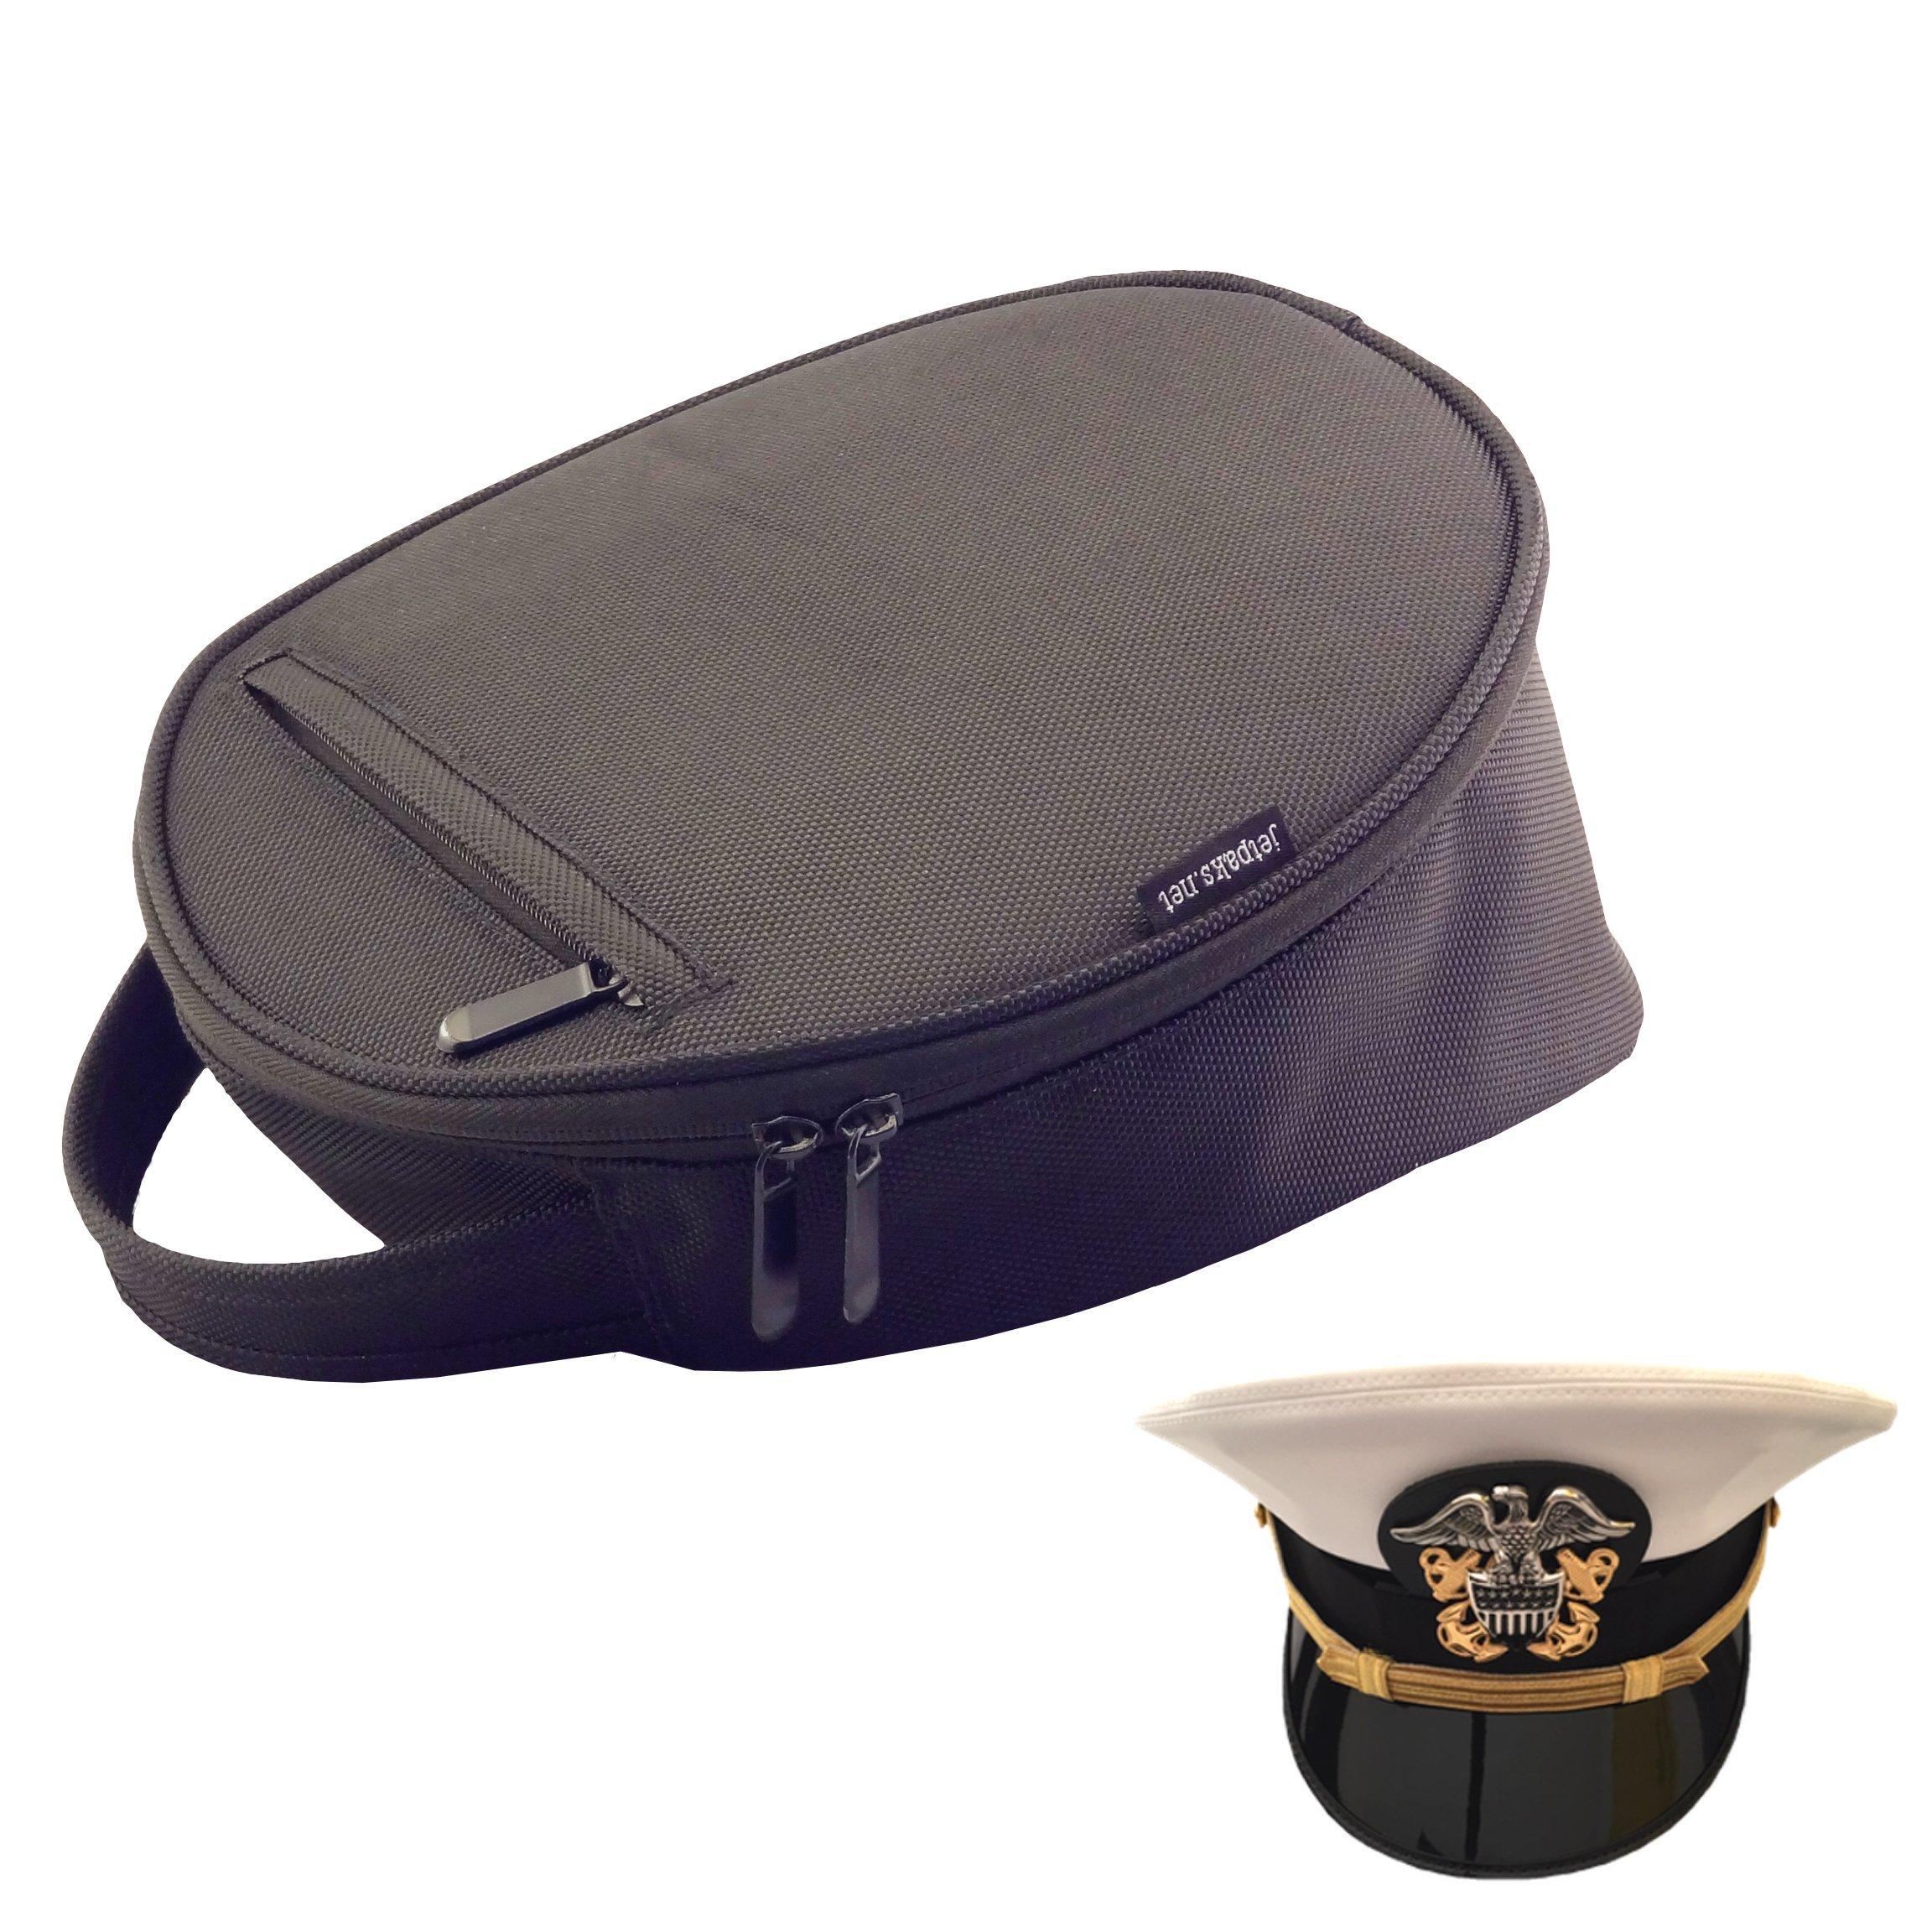 JetPaks.net HatPak Uniform Hat and Cap Travel Carrying Case - Large - Black by JetPaks.net